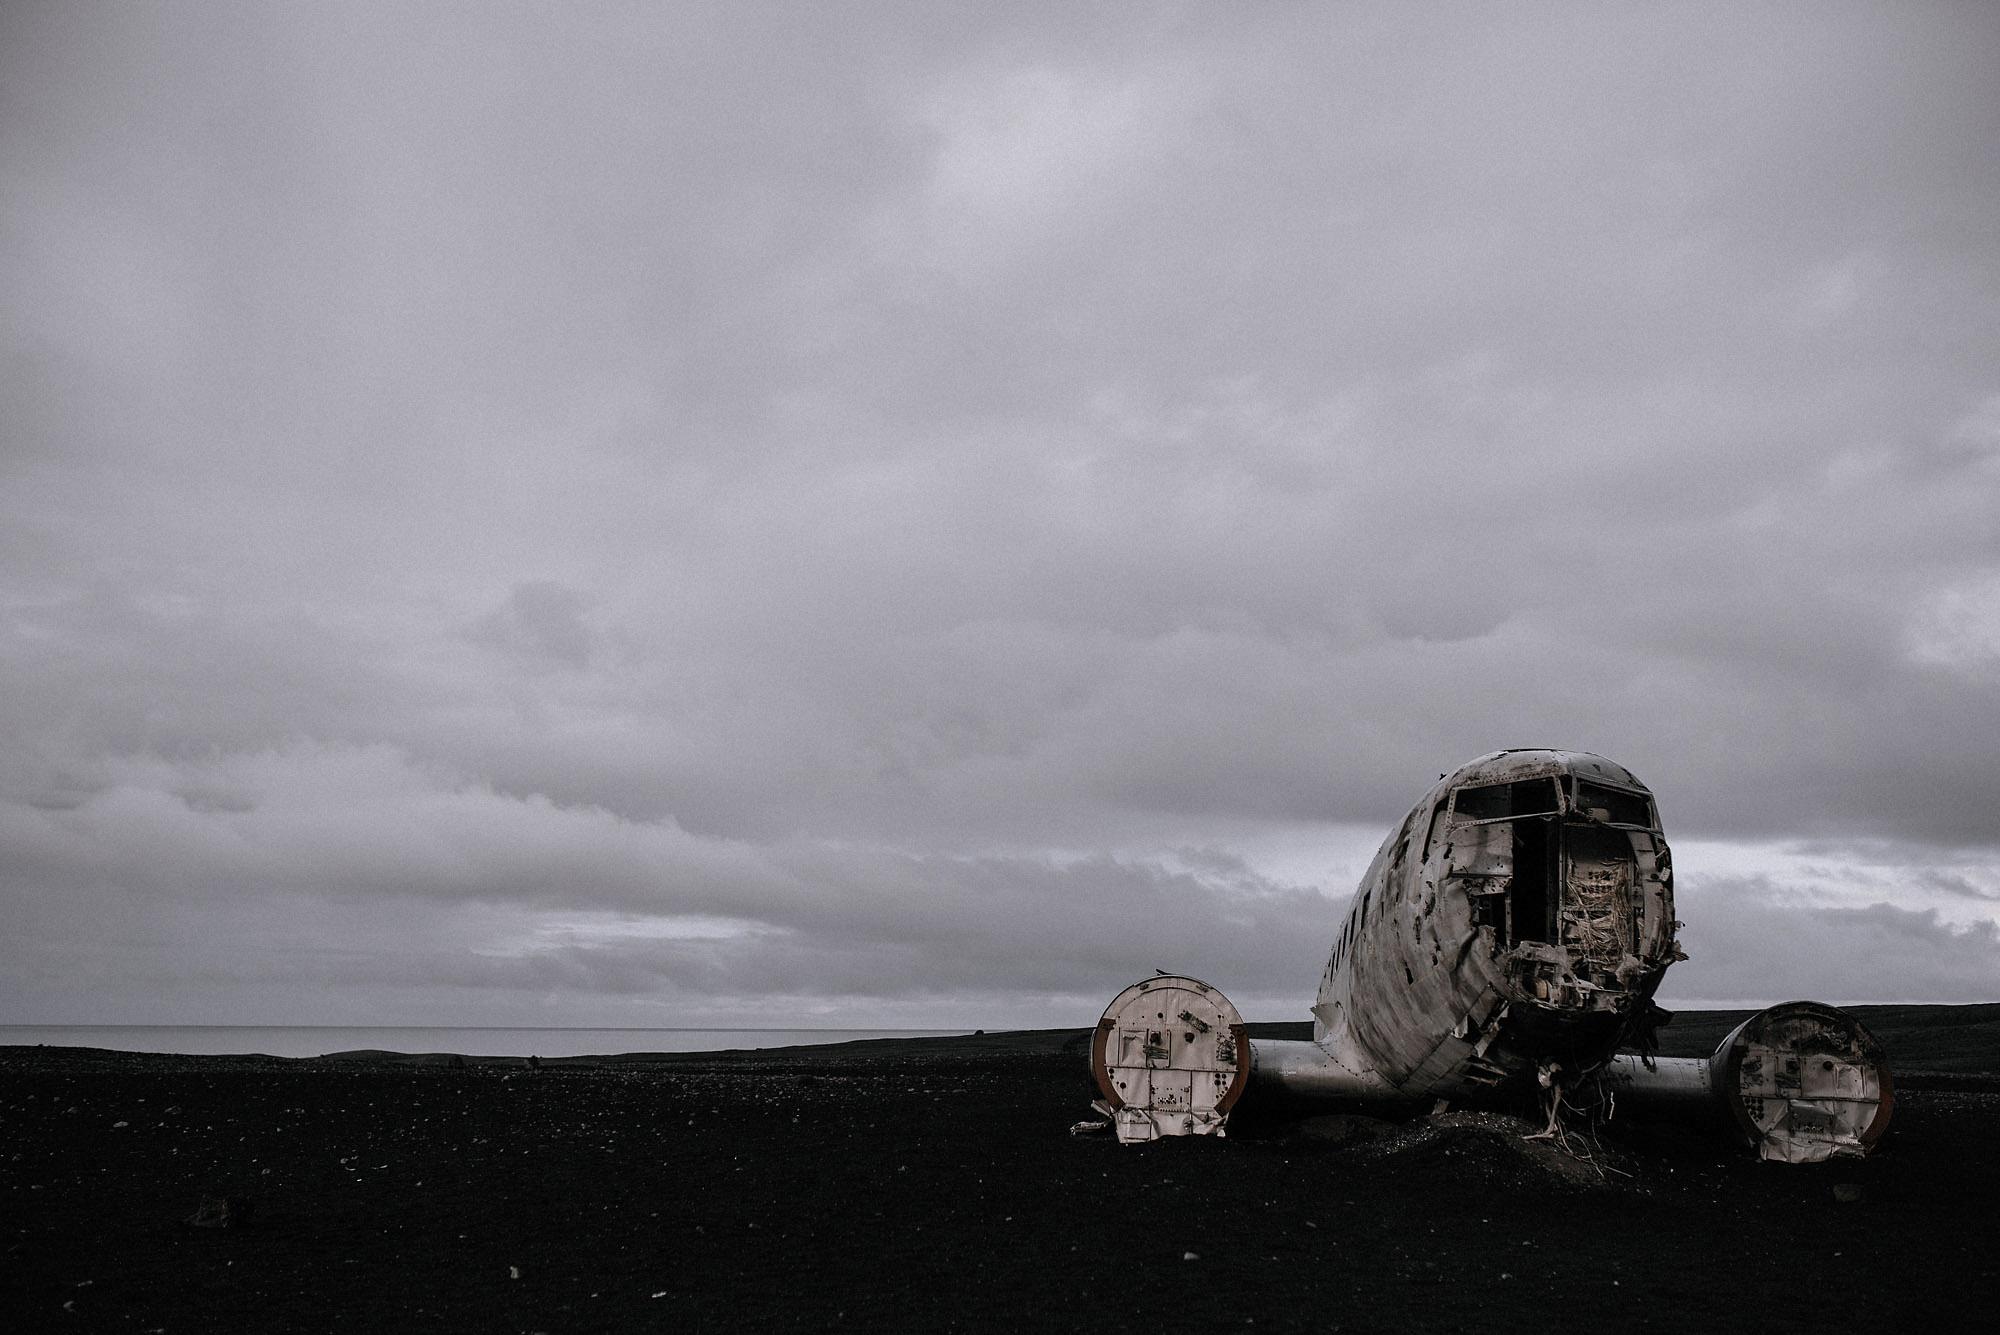 iceland-photographer-reykjavik-jere-satamo-6-web.jpg